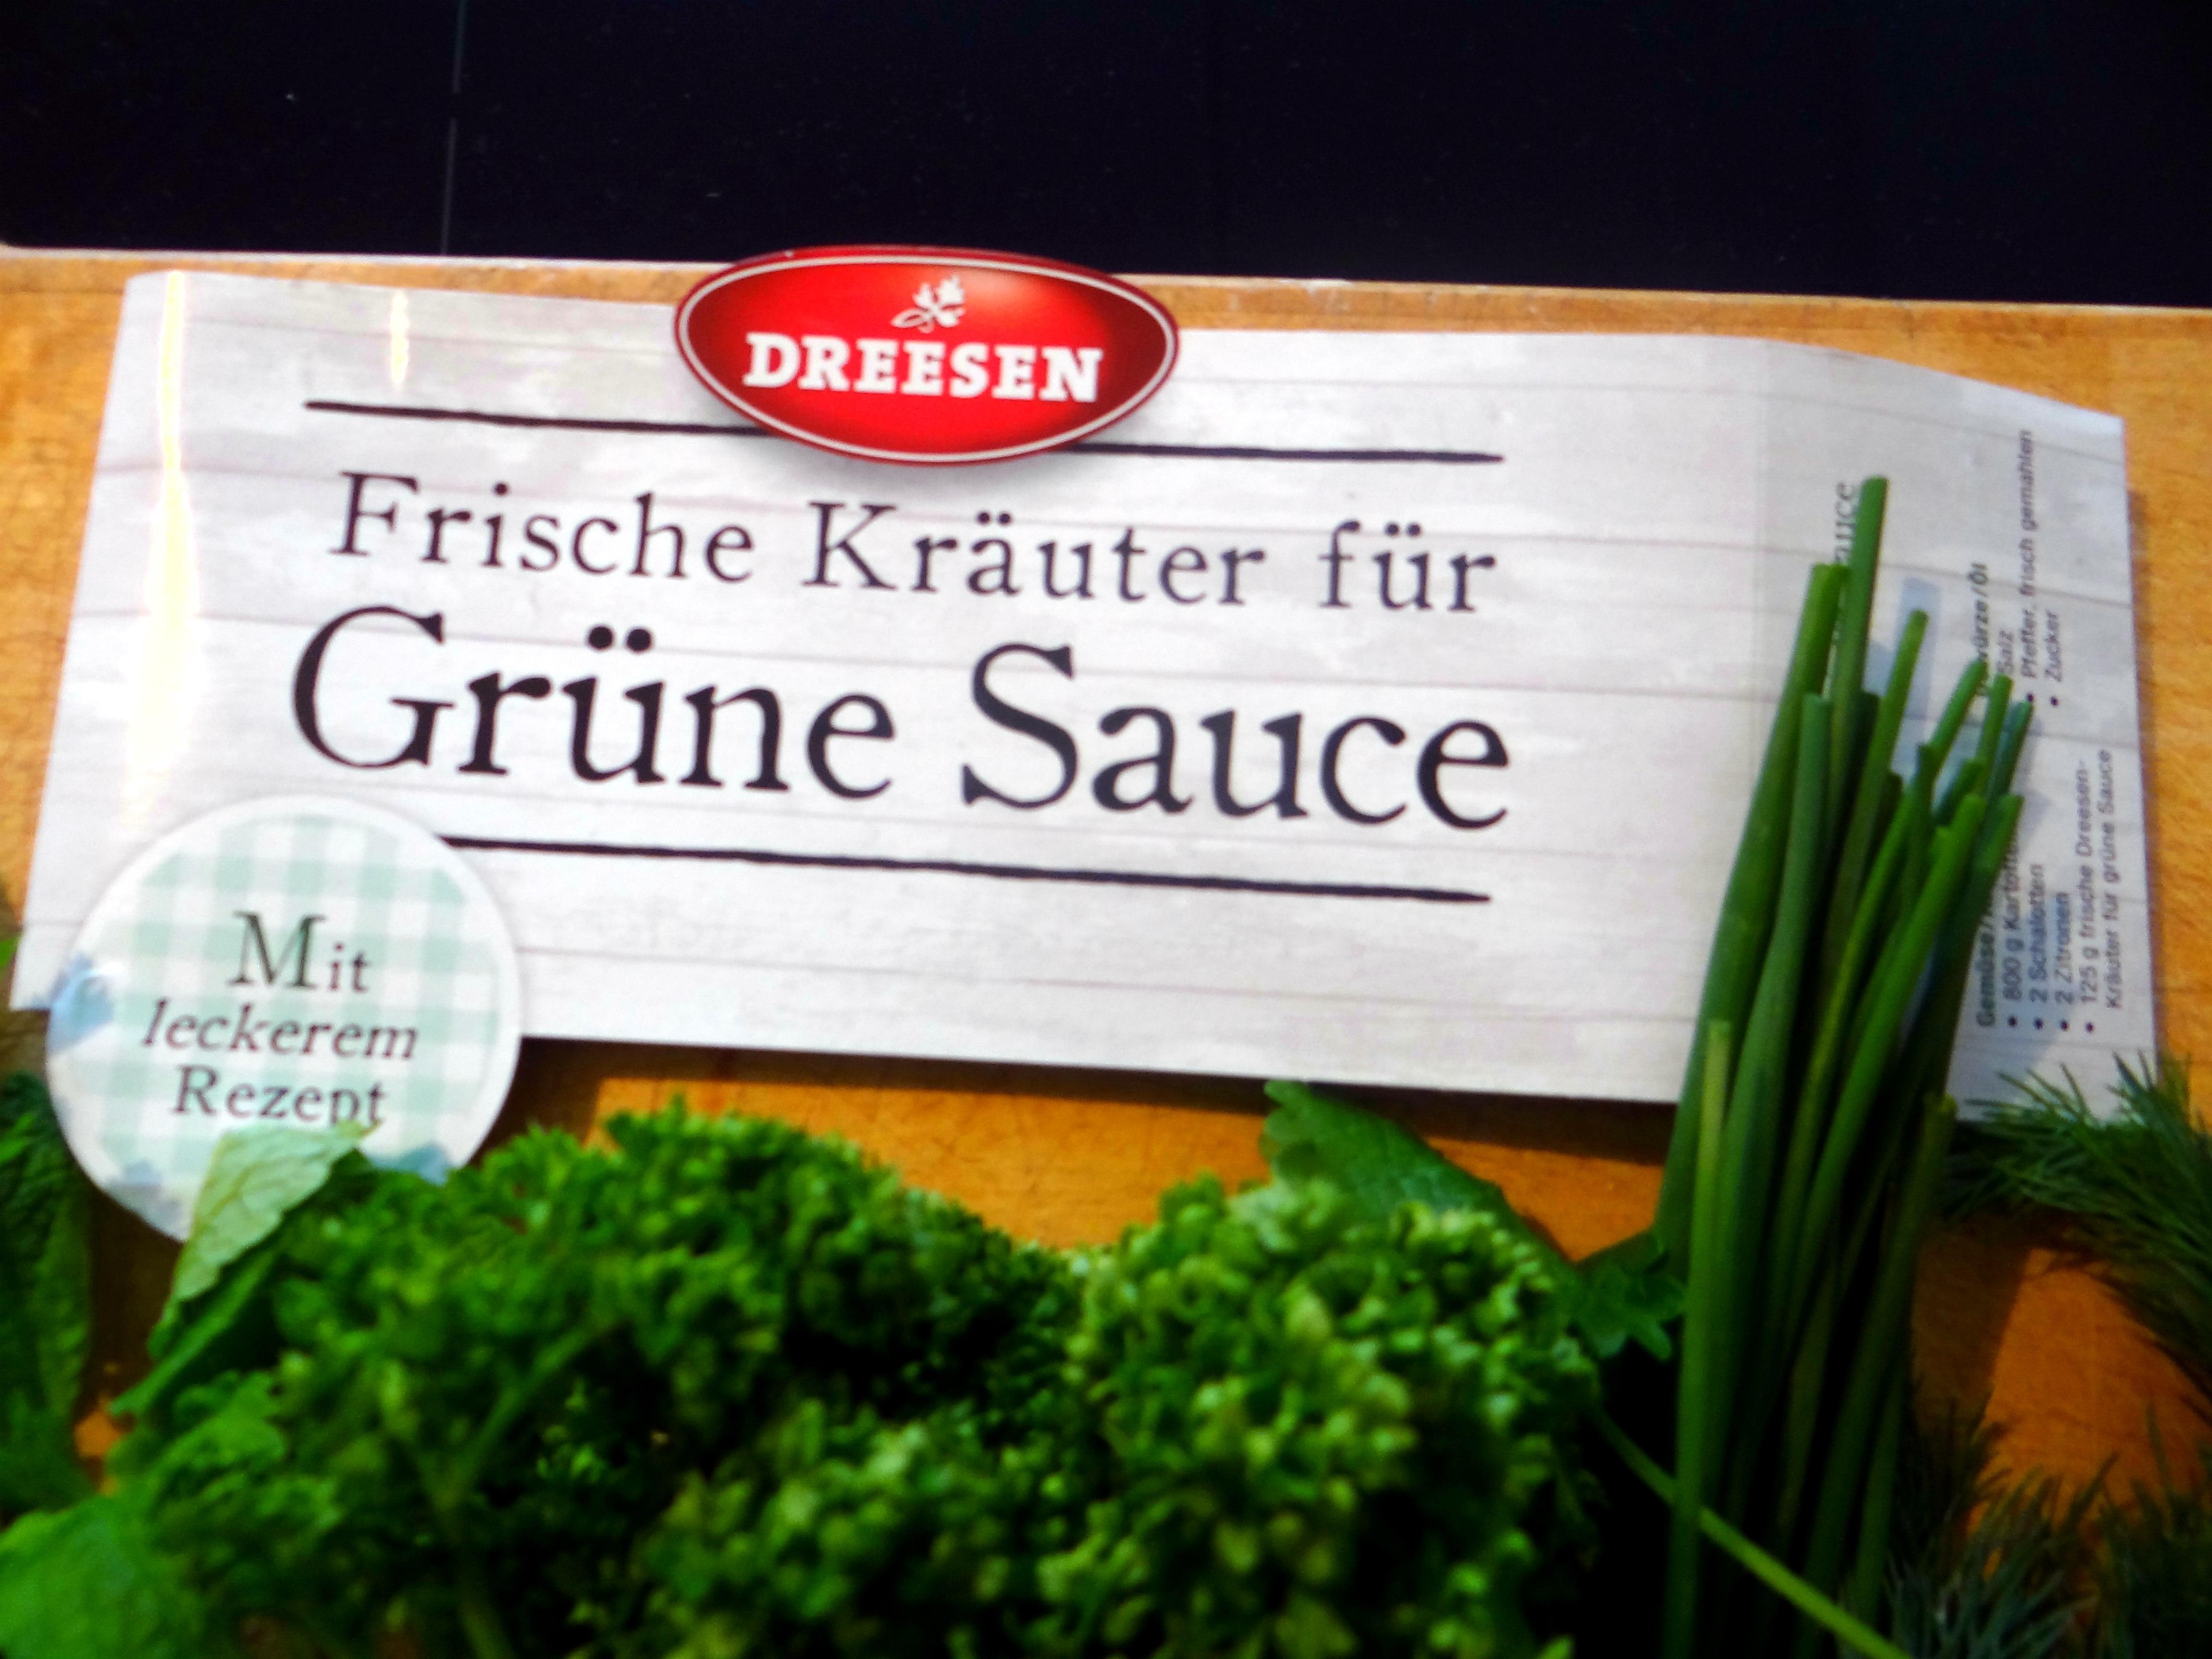 Frankfurter grüne Soße,Pellkartoffeln (9)